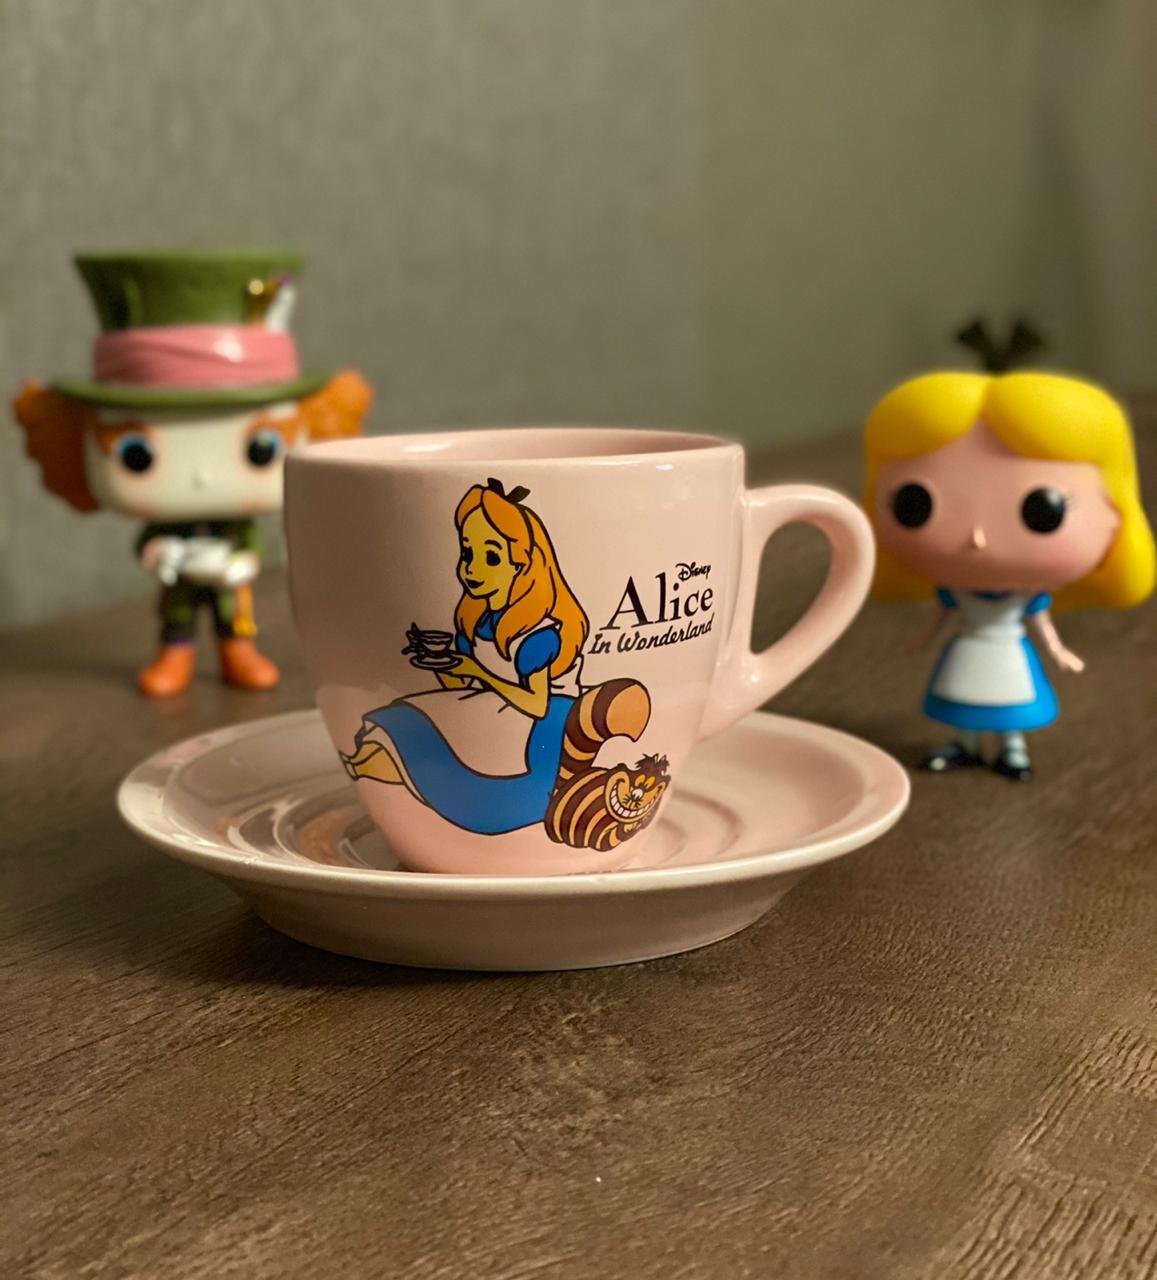 Xícara Alice: Alice No País Das Maravilhas